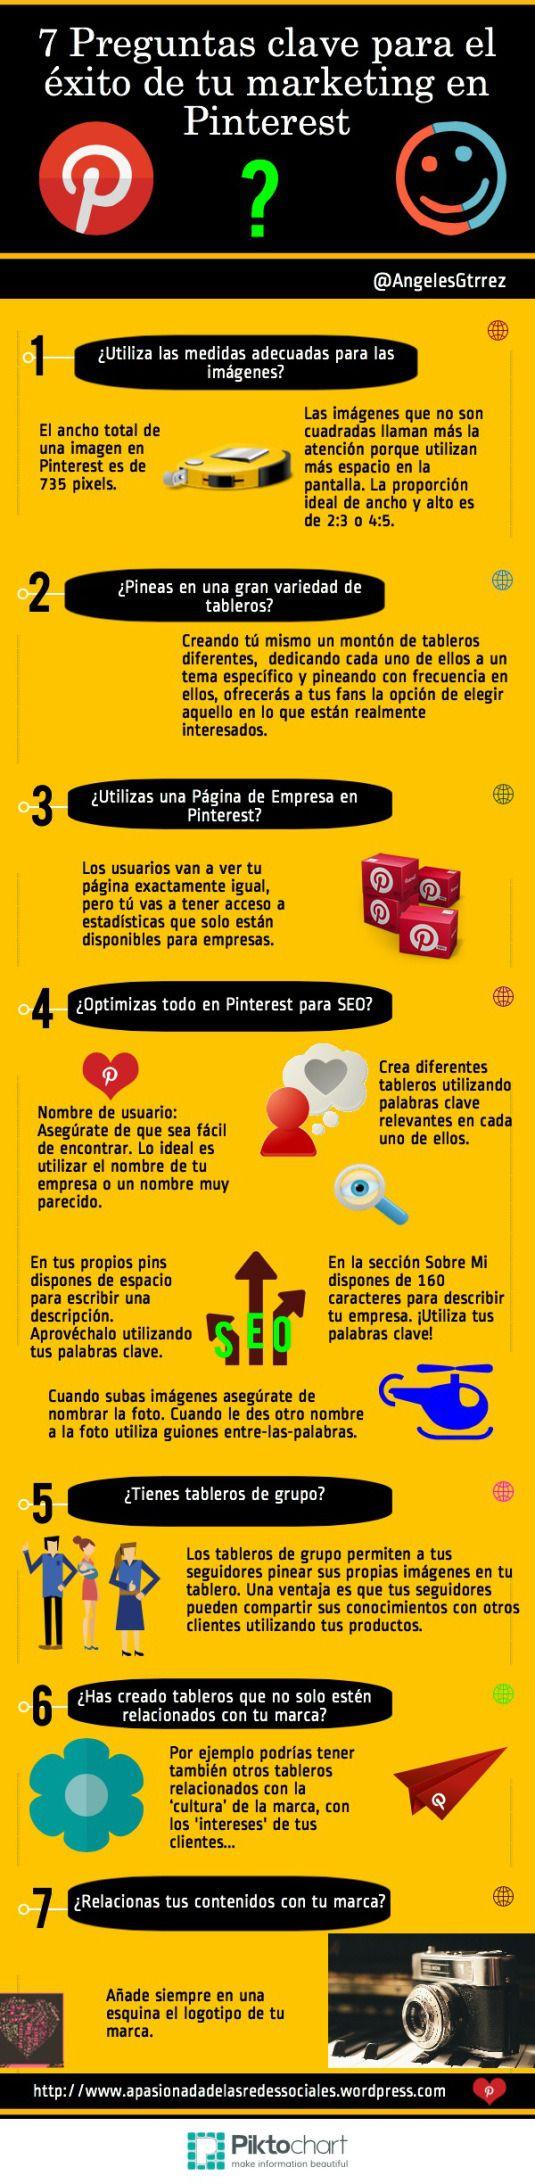 7 preguntas clave para el éxito de tu marketing en Pinterest #infografia #infographic #socialmedia